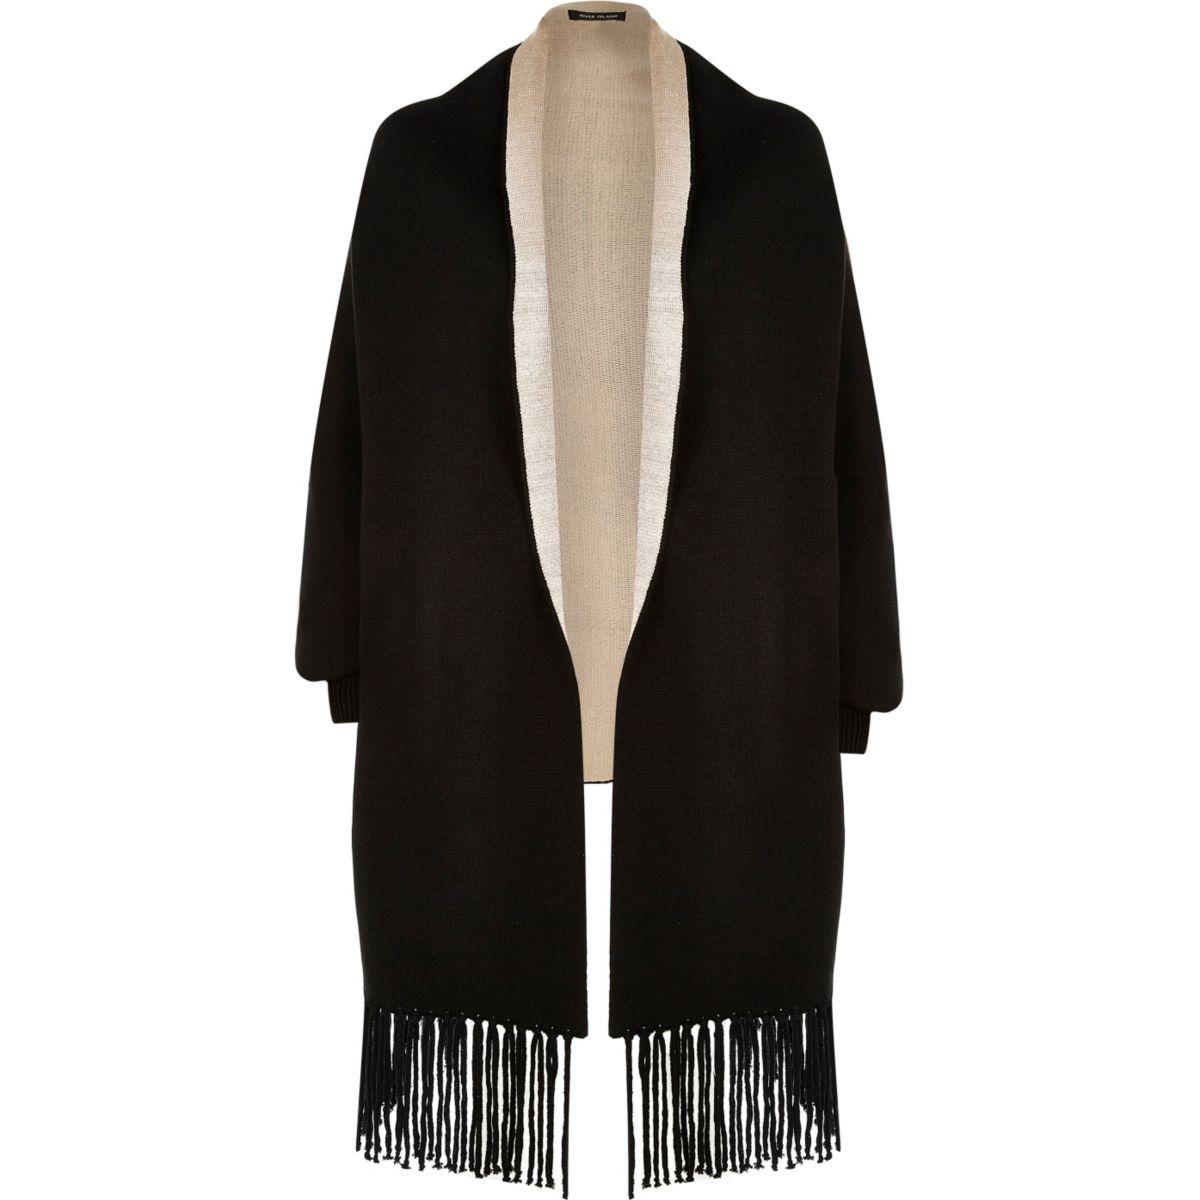 Black knit cape